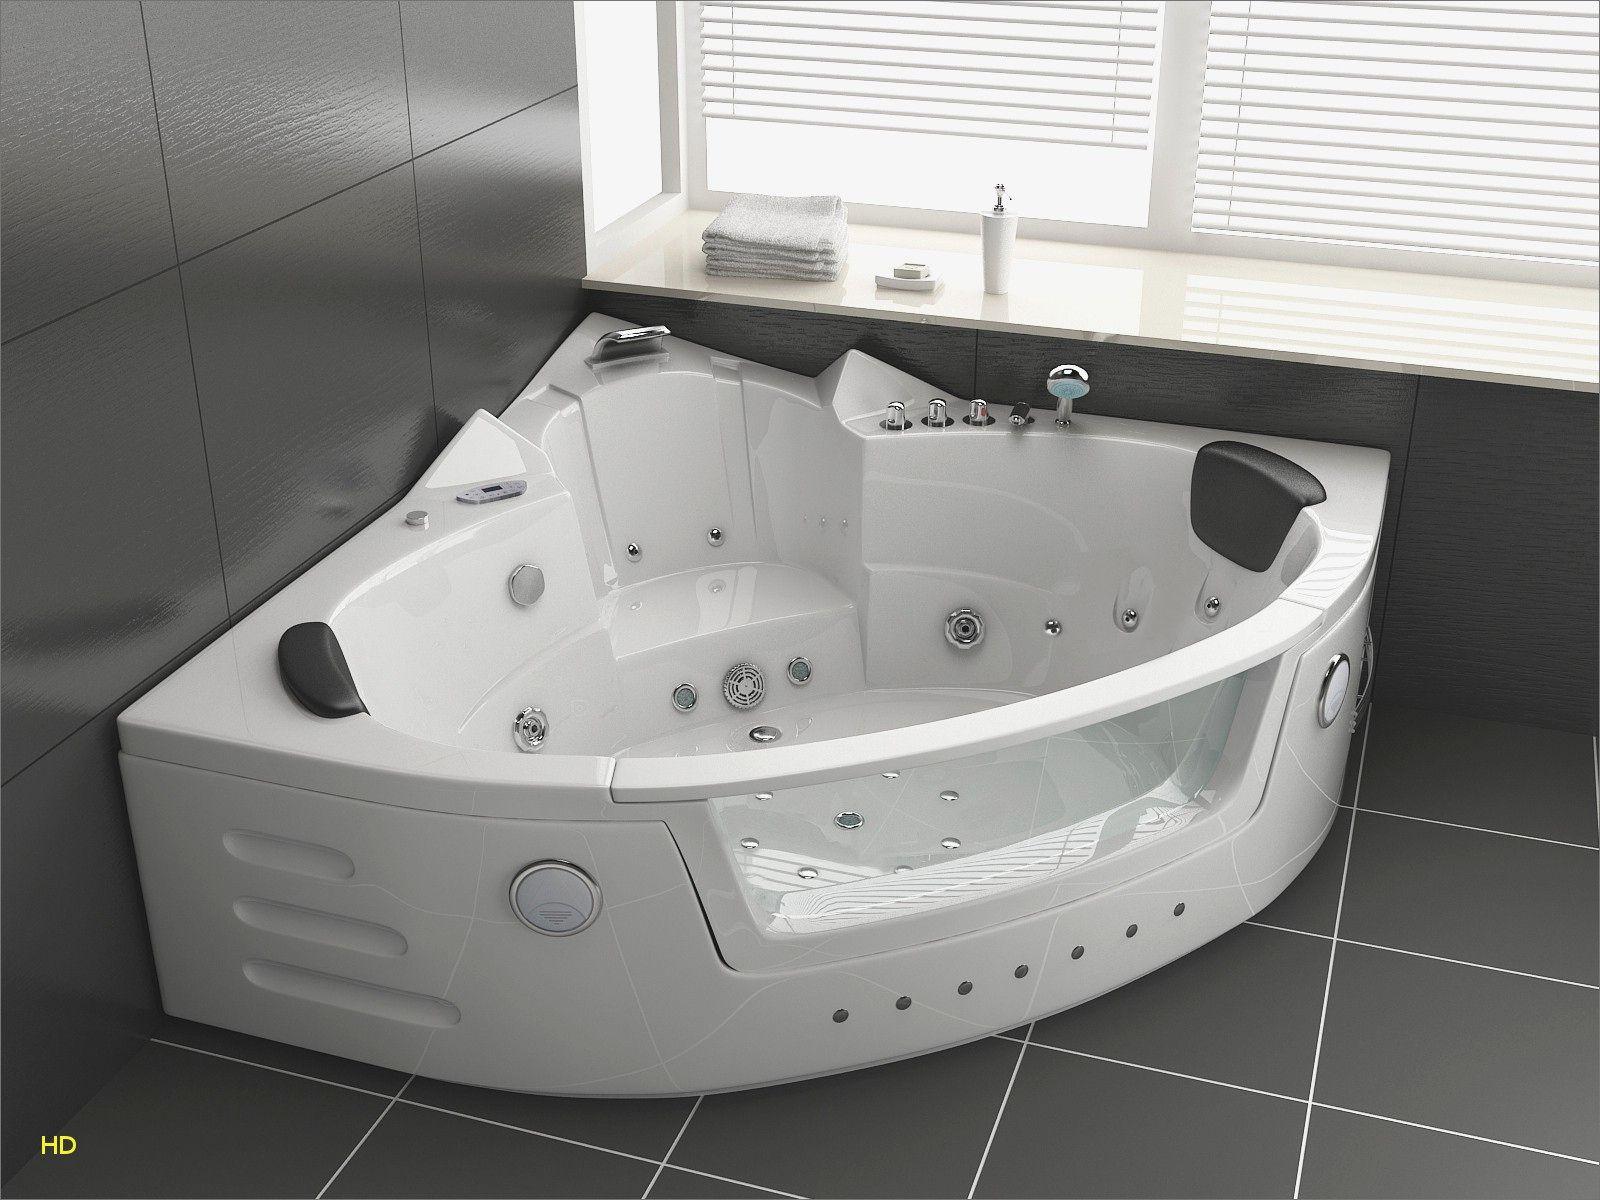 Baignoire D Angle Balneo Baignoire D Angle Balneo Baignoire Balneo Pas Chere Baignoire Balneo 2 Places Place A La Ba Bathtub Design Bathtub Whirlpool Bathtub